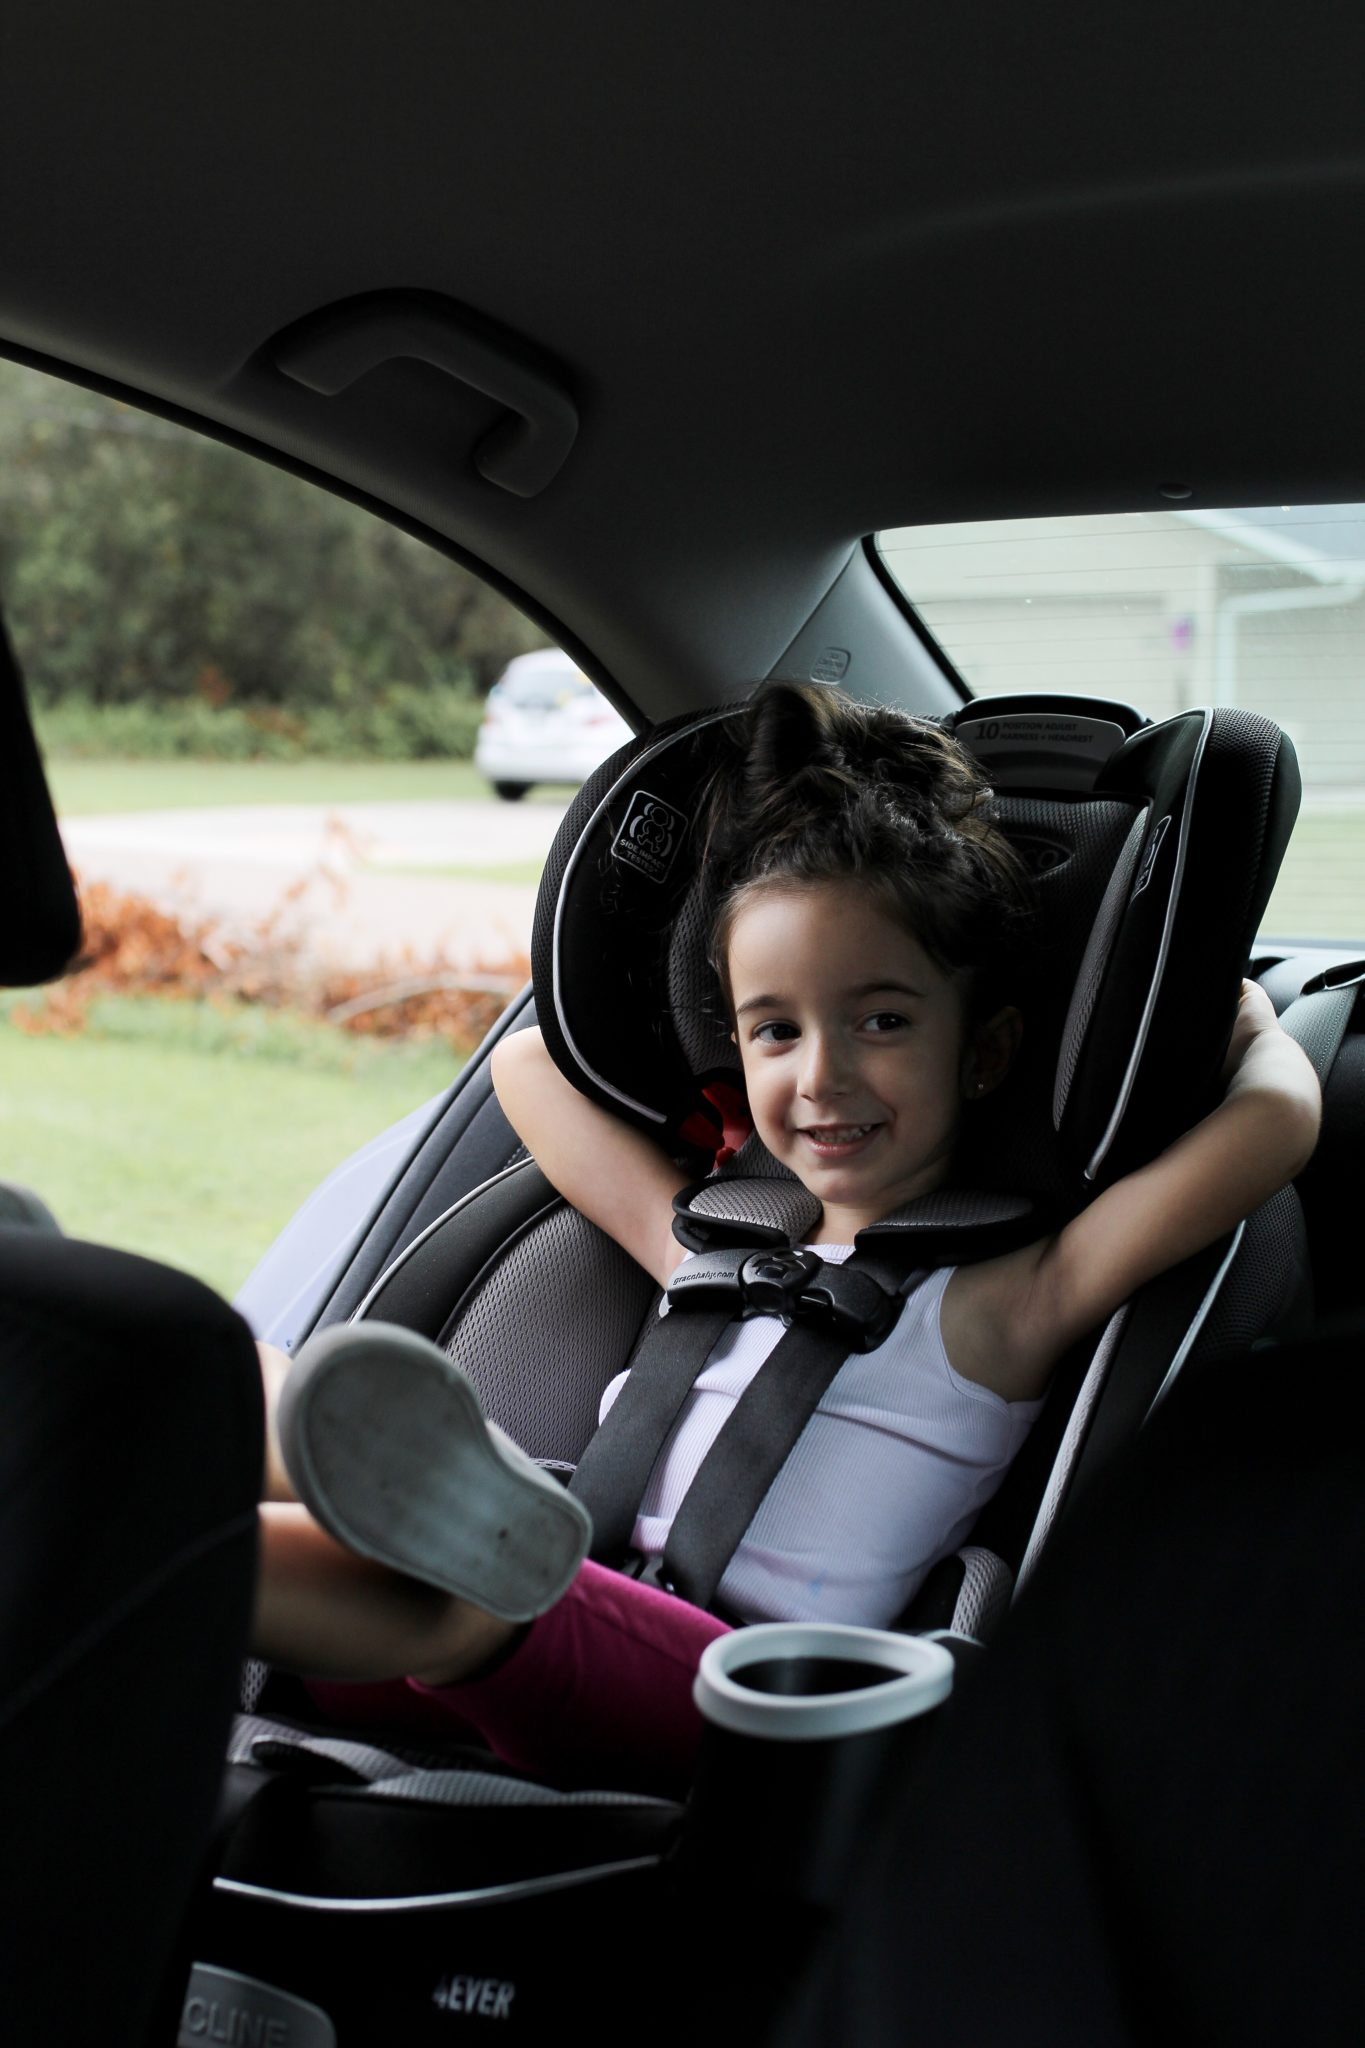 car seat safety infant, car seat safety rear facing, car seat safety aap, car seat safety chest clip, car seat safety check,car seat height and weight guidelines, car seat safety straps, car seat safety statistics